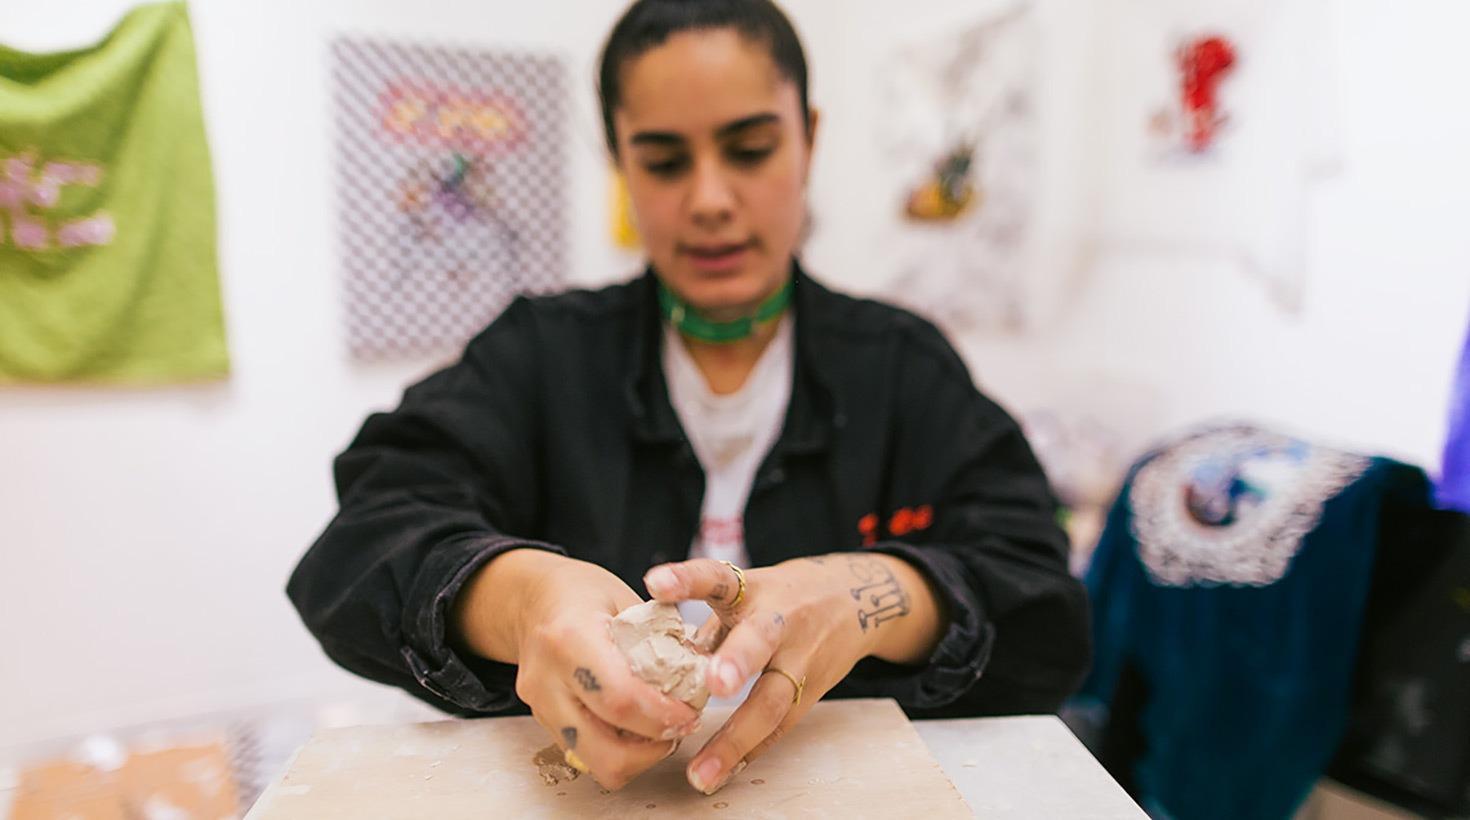 Women preparing clay for a sculpture